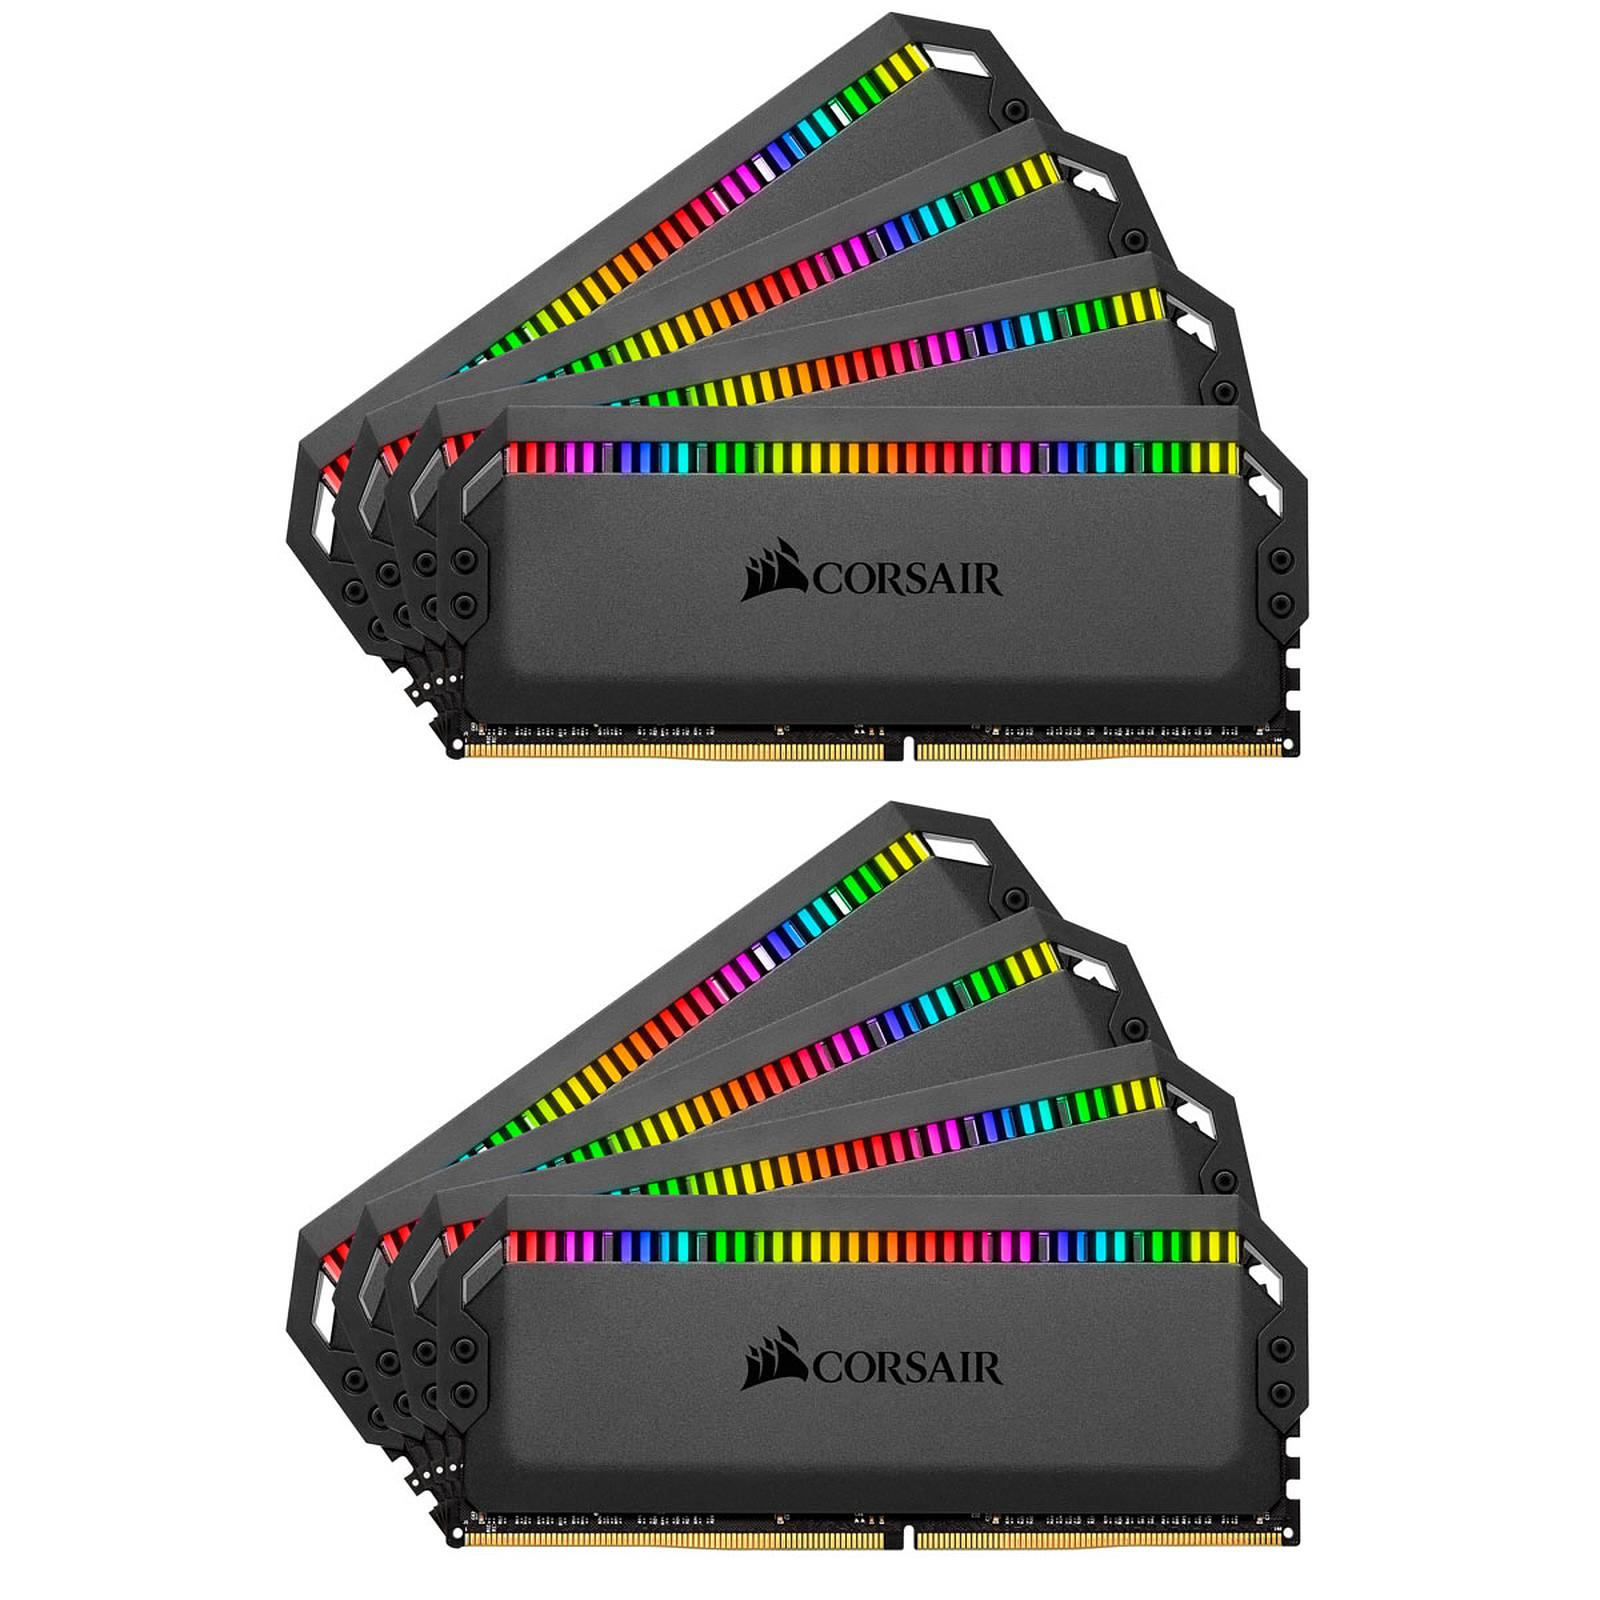 Corsair Dominator Platinum RGB 64 Go (8x 8Go) DDR4 4266 MHz CL19